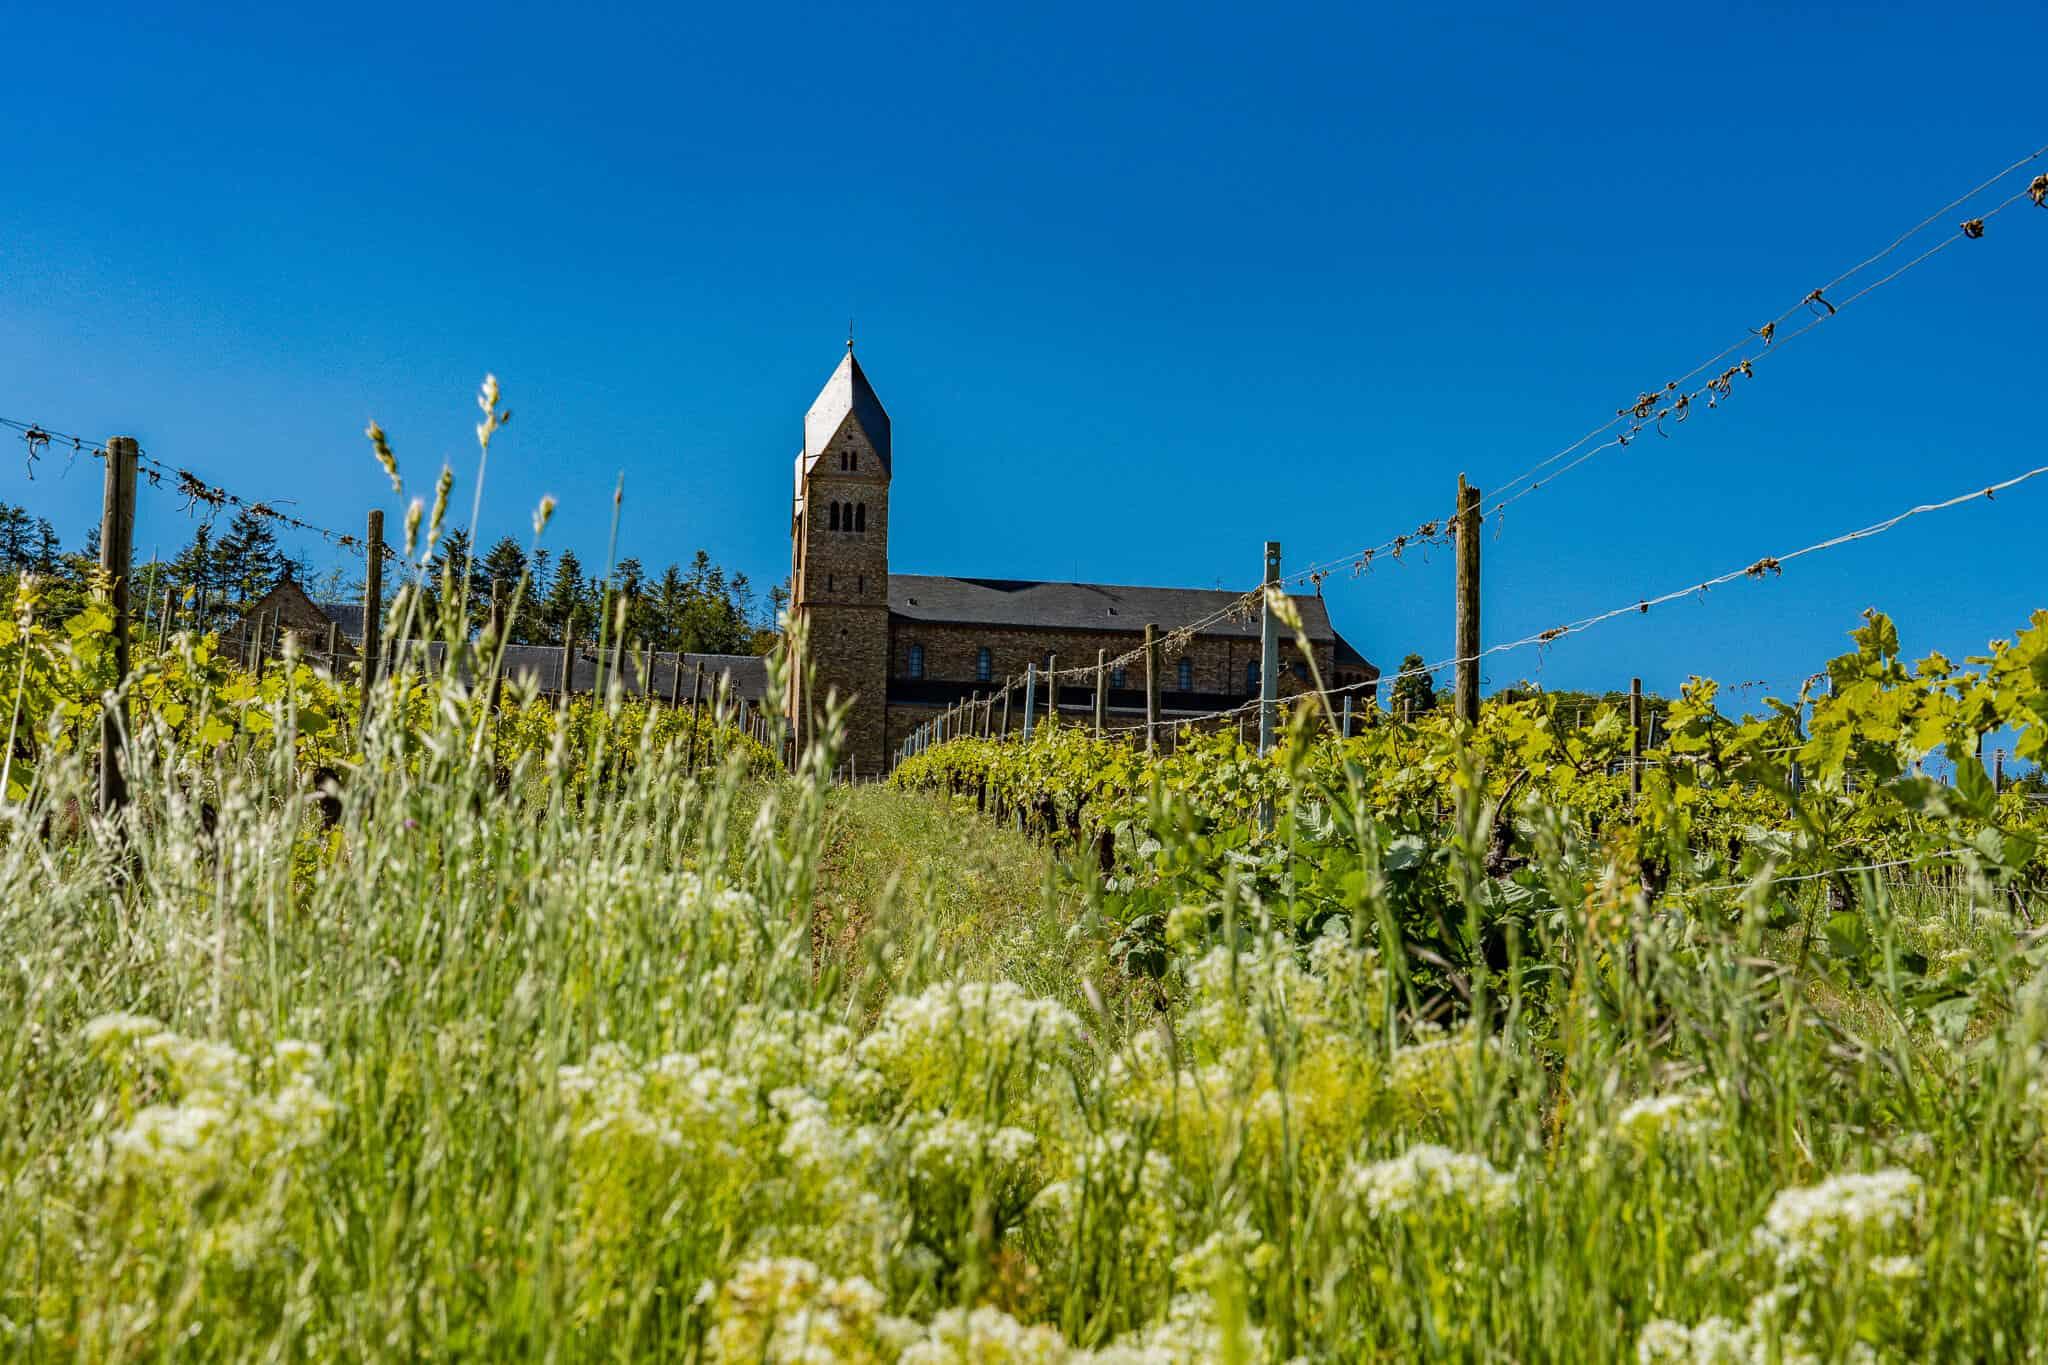 Abtei St Hildegard